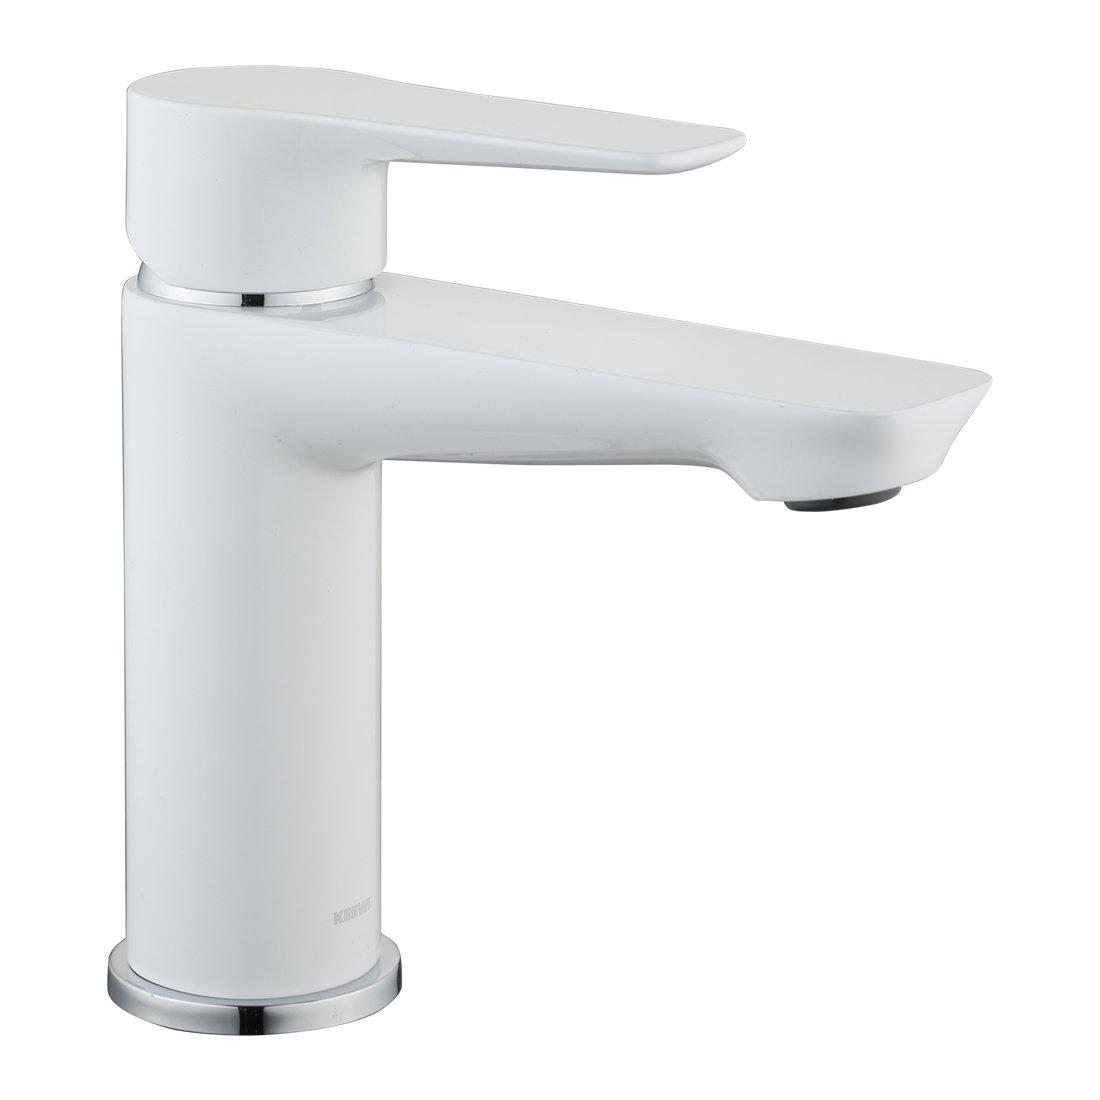 Modern Bathroom Faucet Single Handle Solid Brass Body Construction